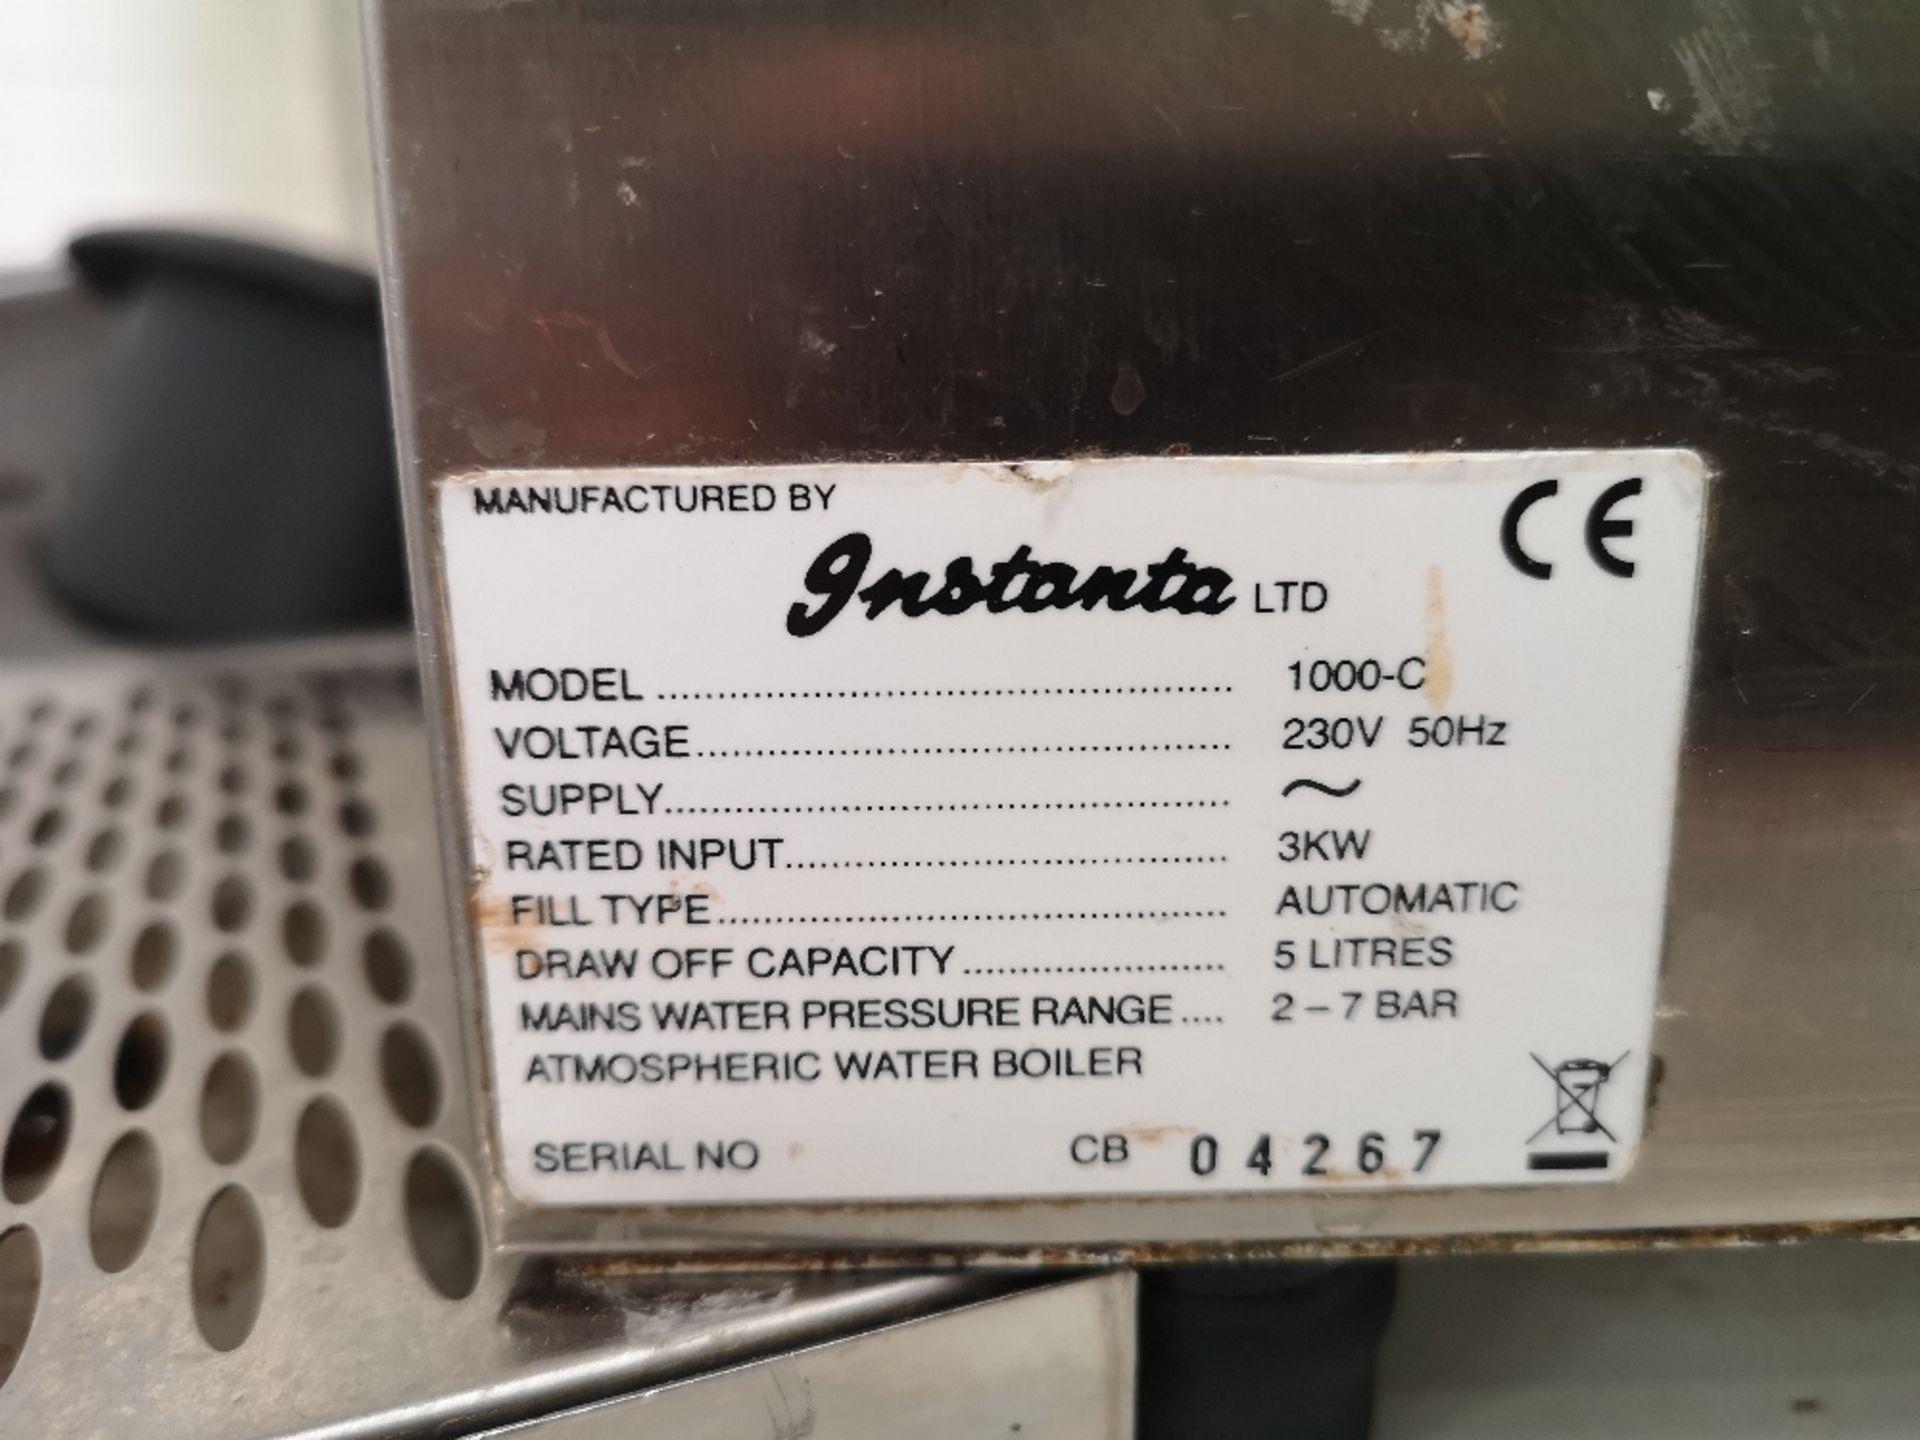 Instanta 1000-C CTS5 SureFlow Compact Countertop 5Ltr Water Boiler - Image 4 of 4